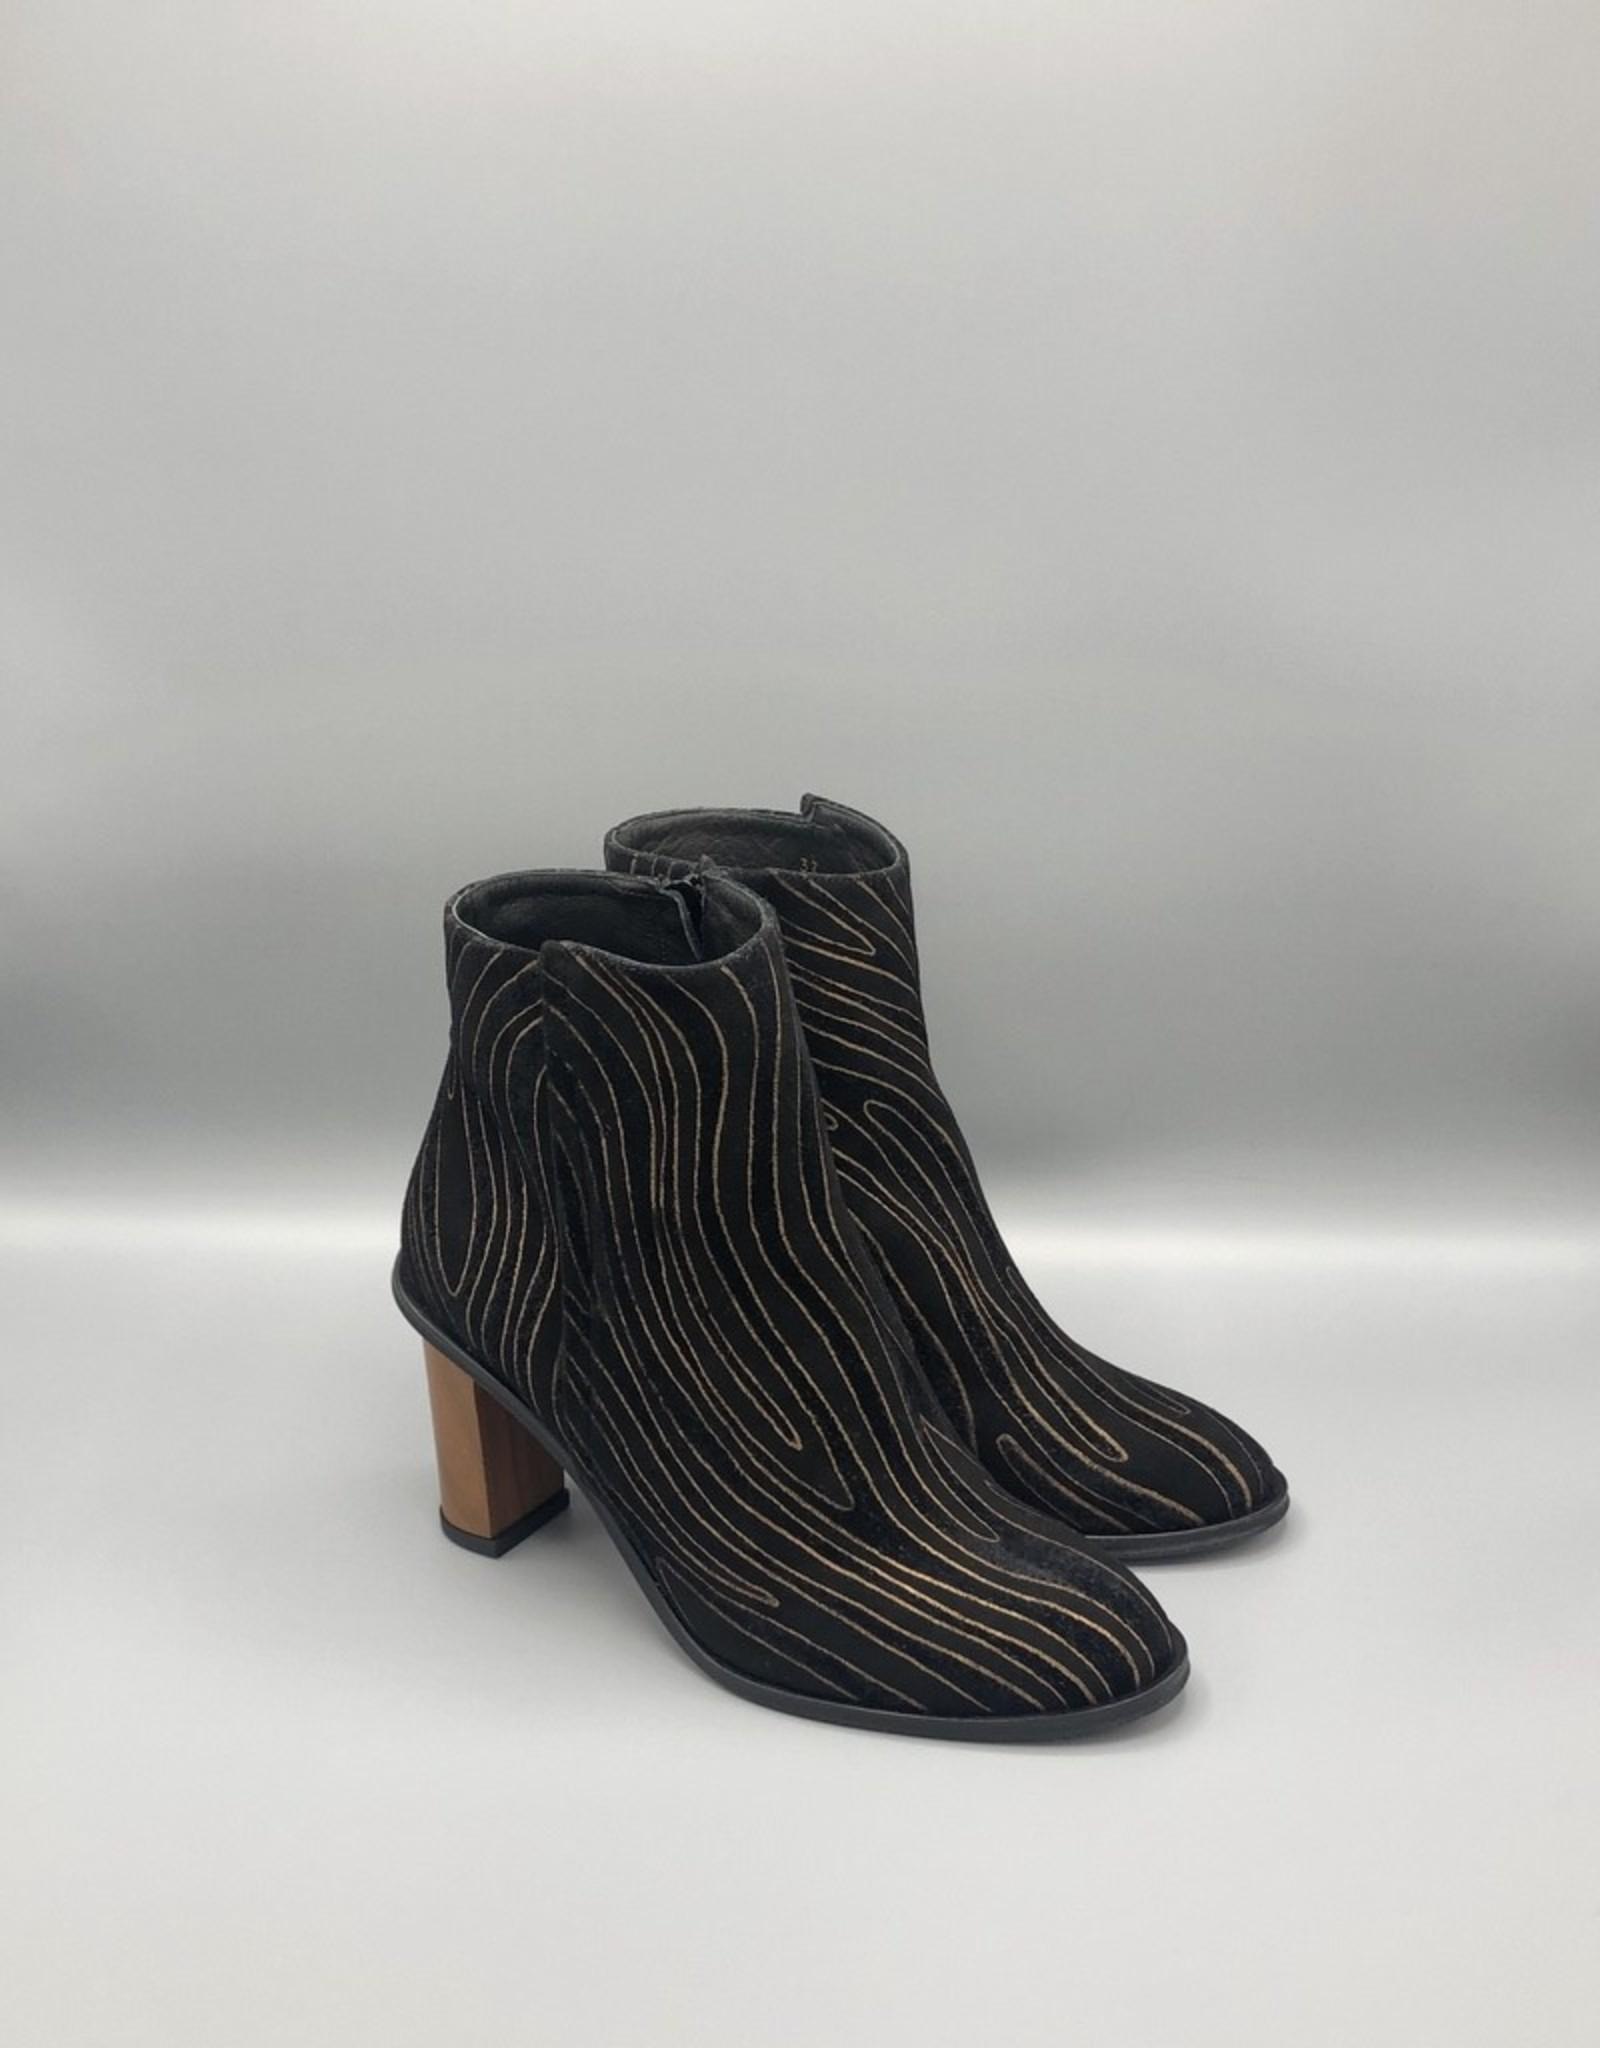 Thiron Thiron Wood Heel Round Toe Topo Print Ankle Boot